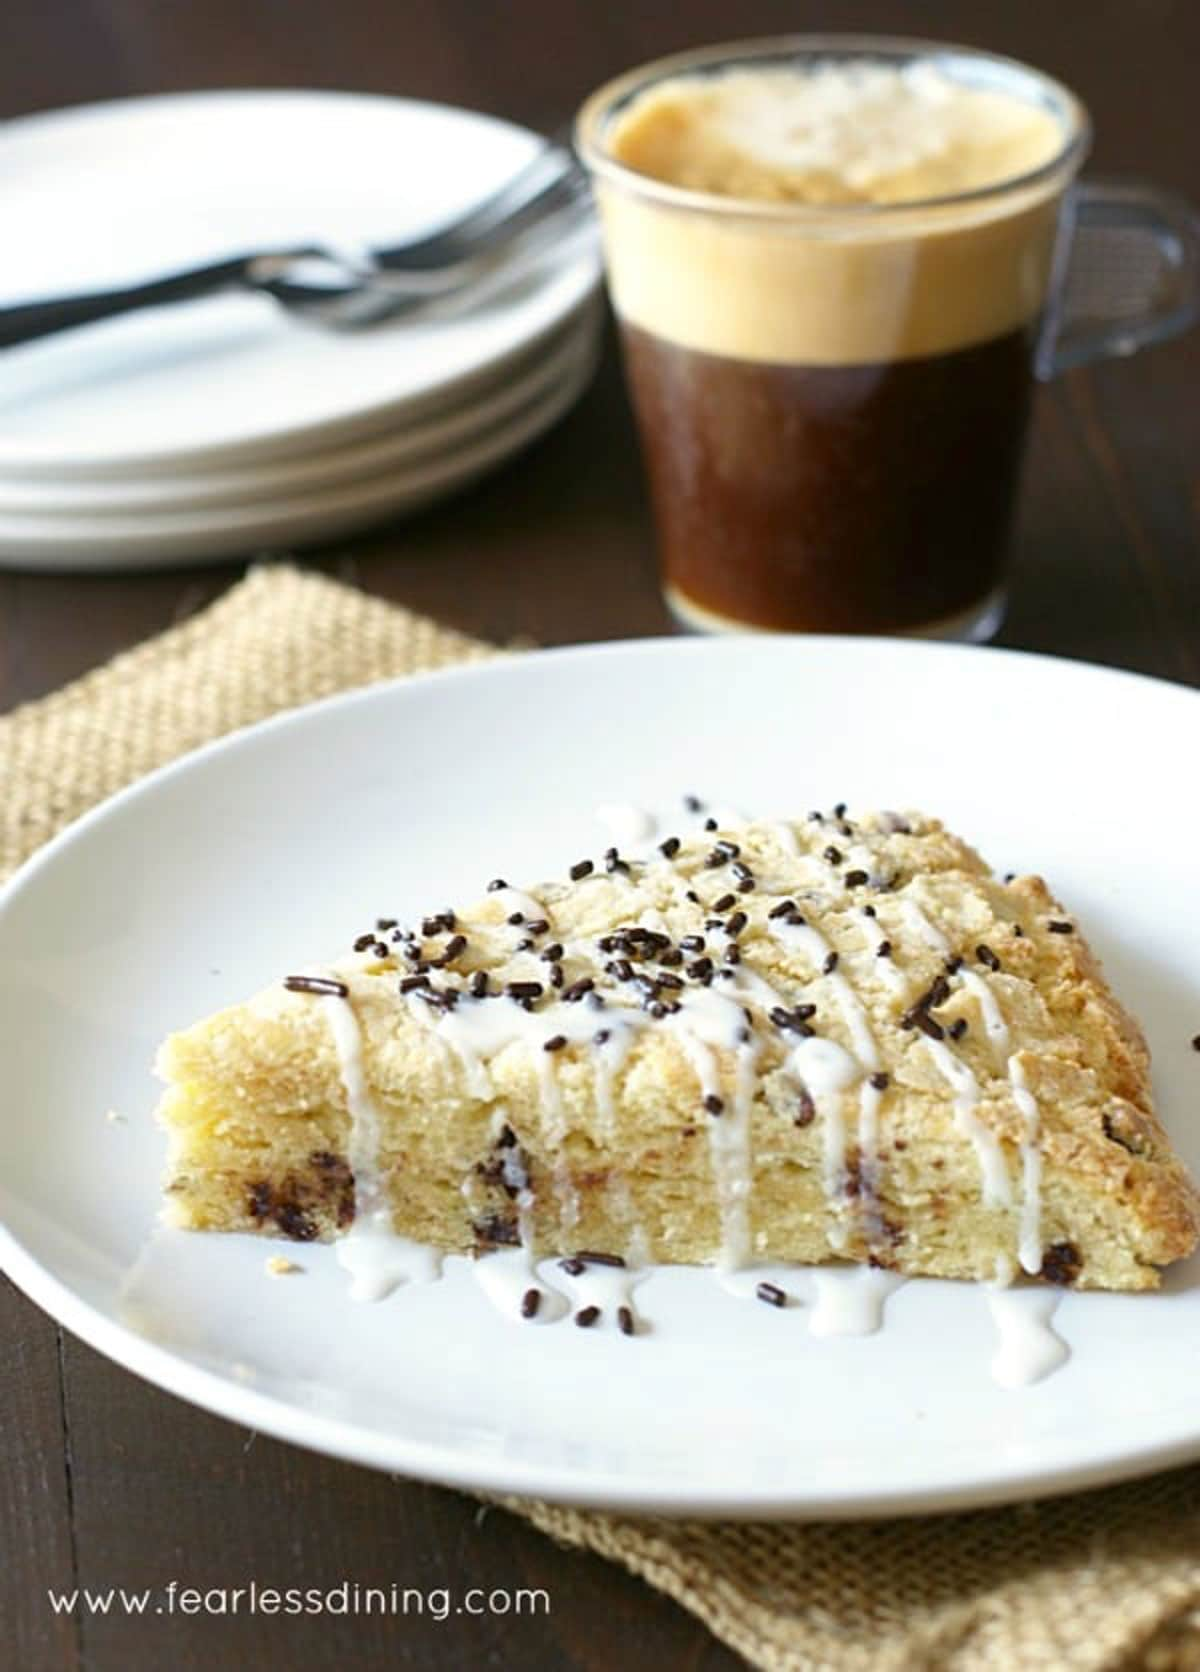 an eggnog scone on a plate next to a mug of coffee